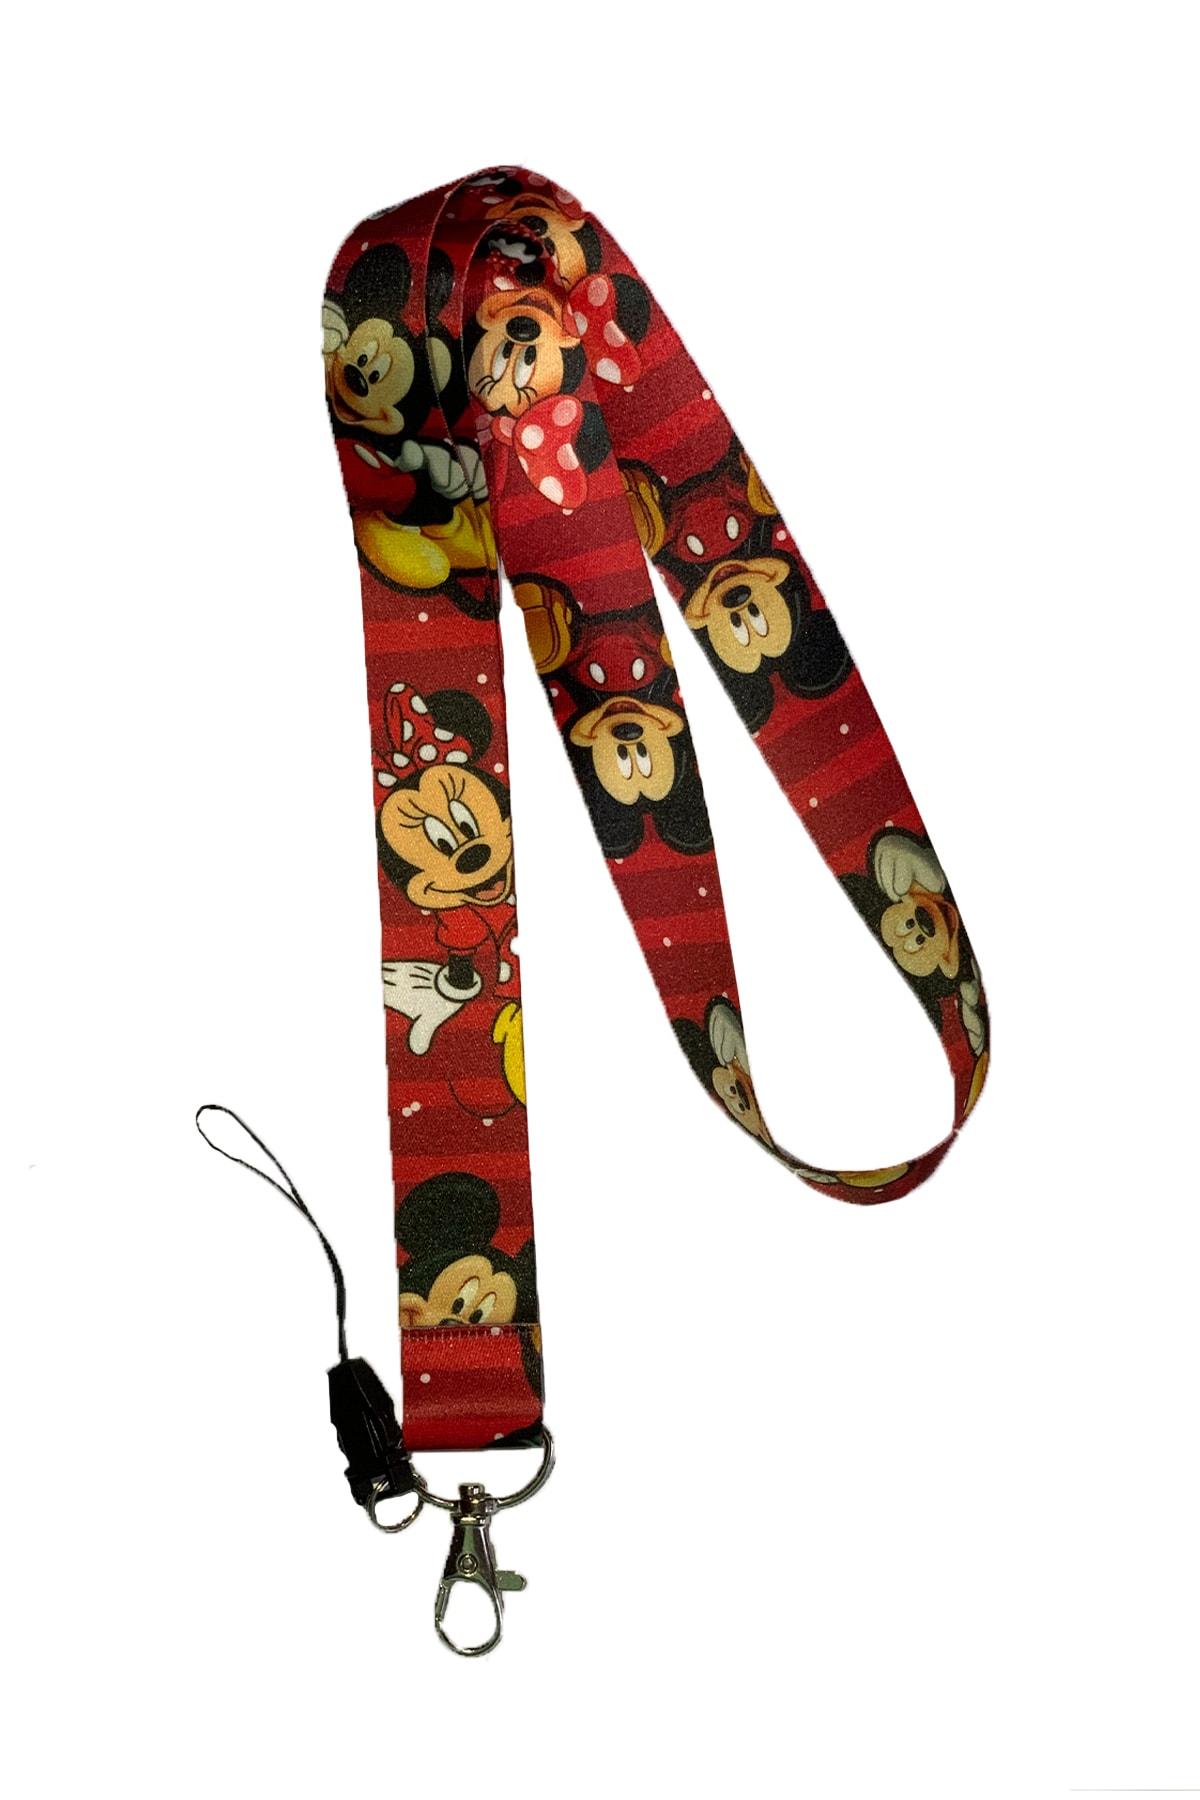 StormiStoretr Minnie Mouse Boyun Askı Ipi Yaka Kartlığı 1